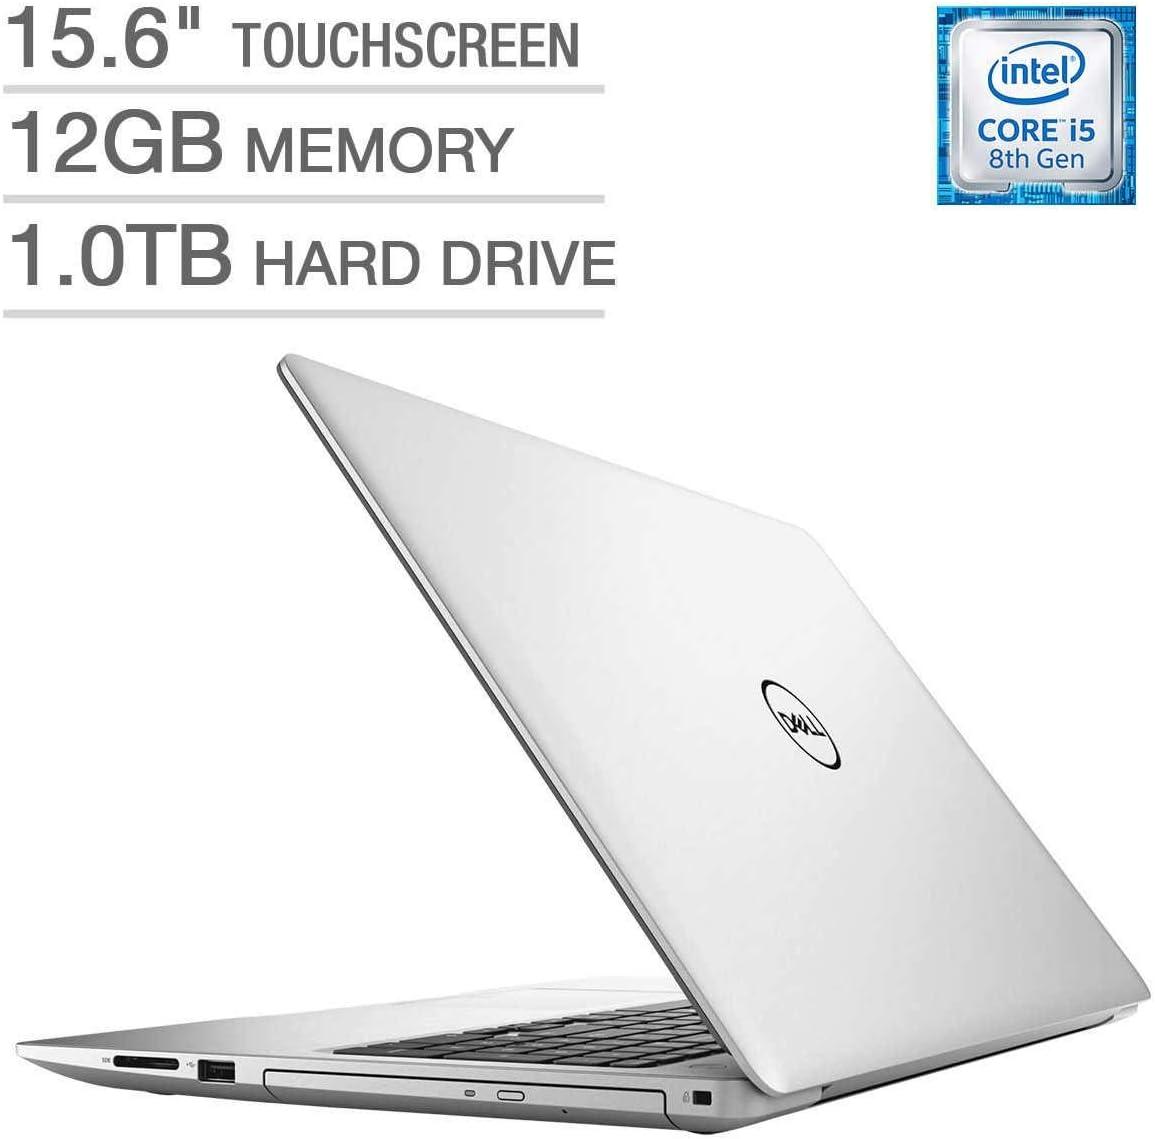 Dell Inspiron 15 5000 15.6-inch Touchscreen FHD 1080p Premium Laptop, Intel Quad Core i5-8250U Processor, 12GB RAM, 1TB Hard Drive, DVD Writer, Backlit Keyboard, Bluetooth, Silver (Renewed)